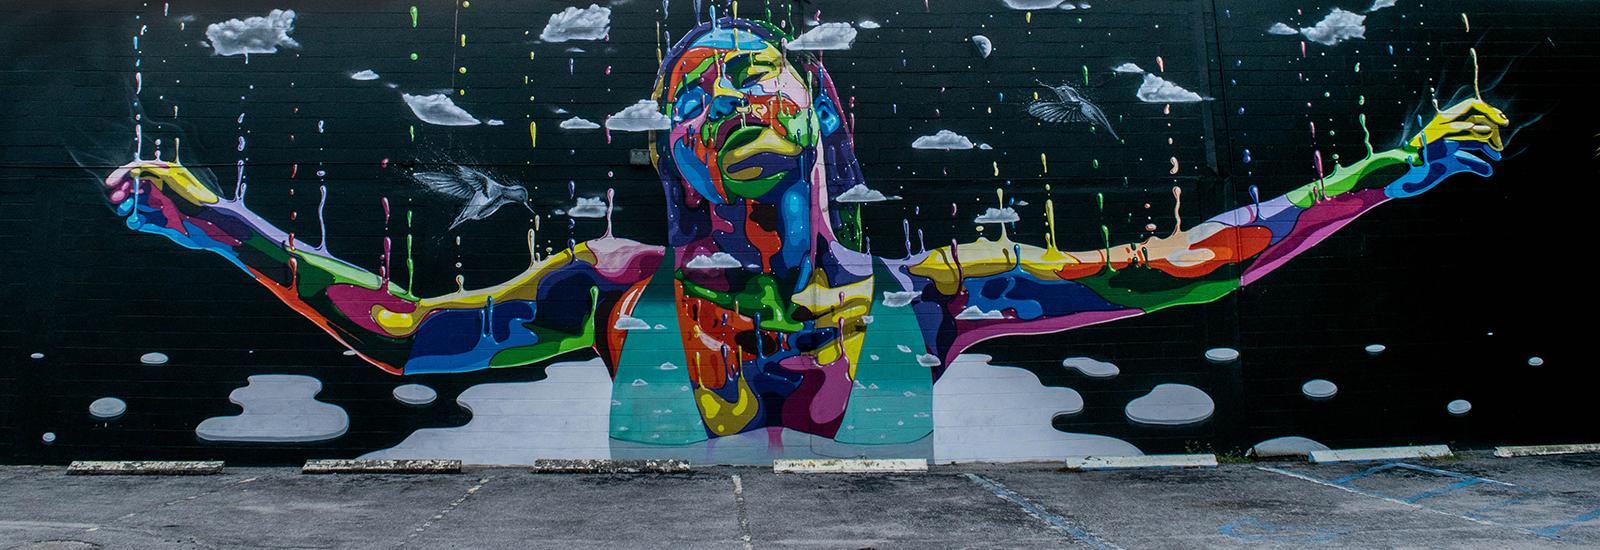 Urban mural tour in St Petersburg, Florida – The World Is Kullin